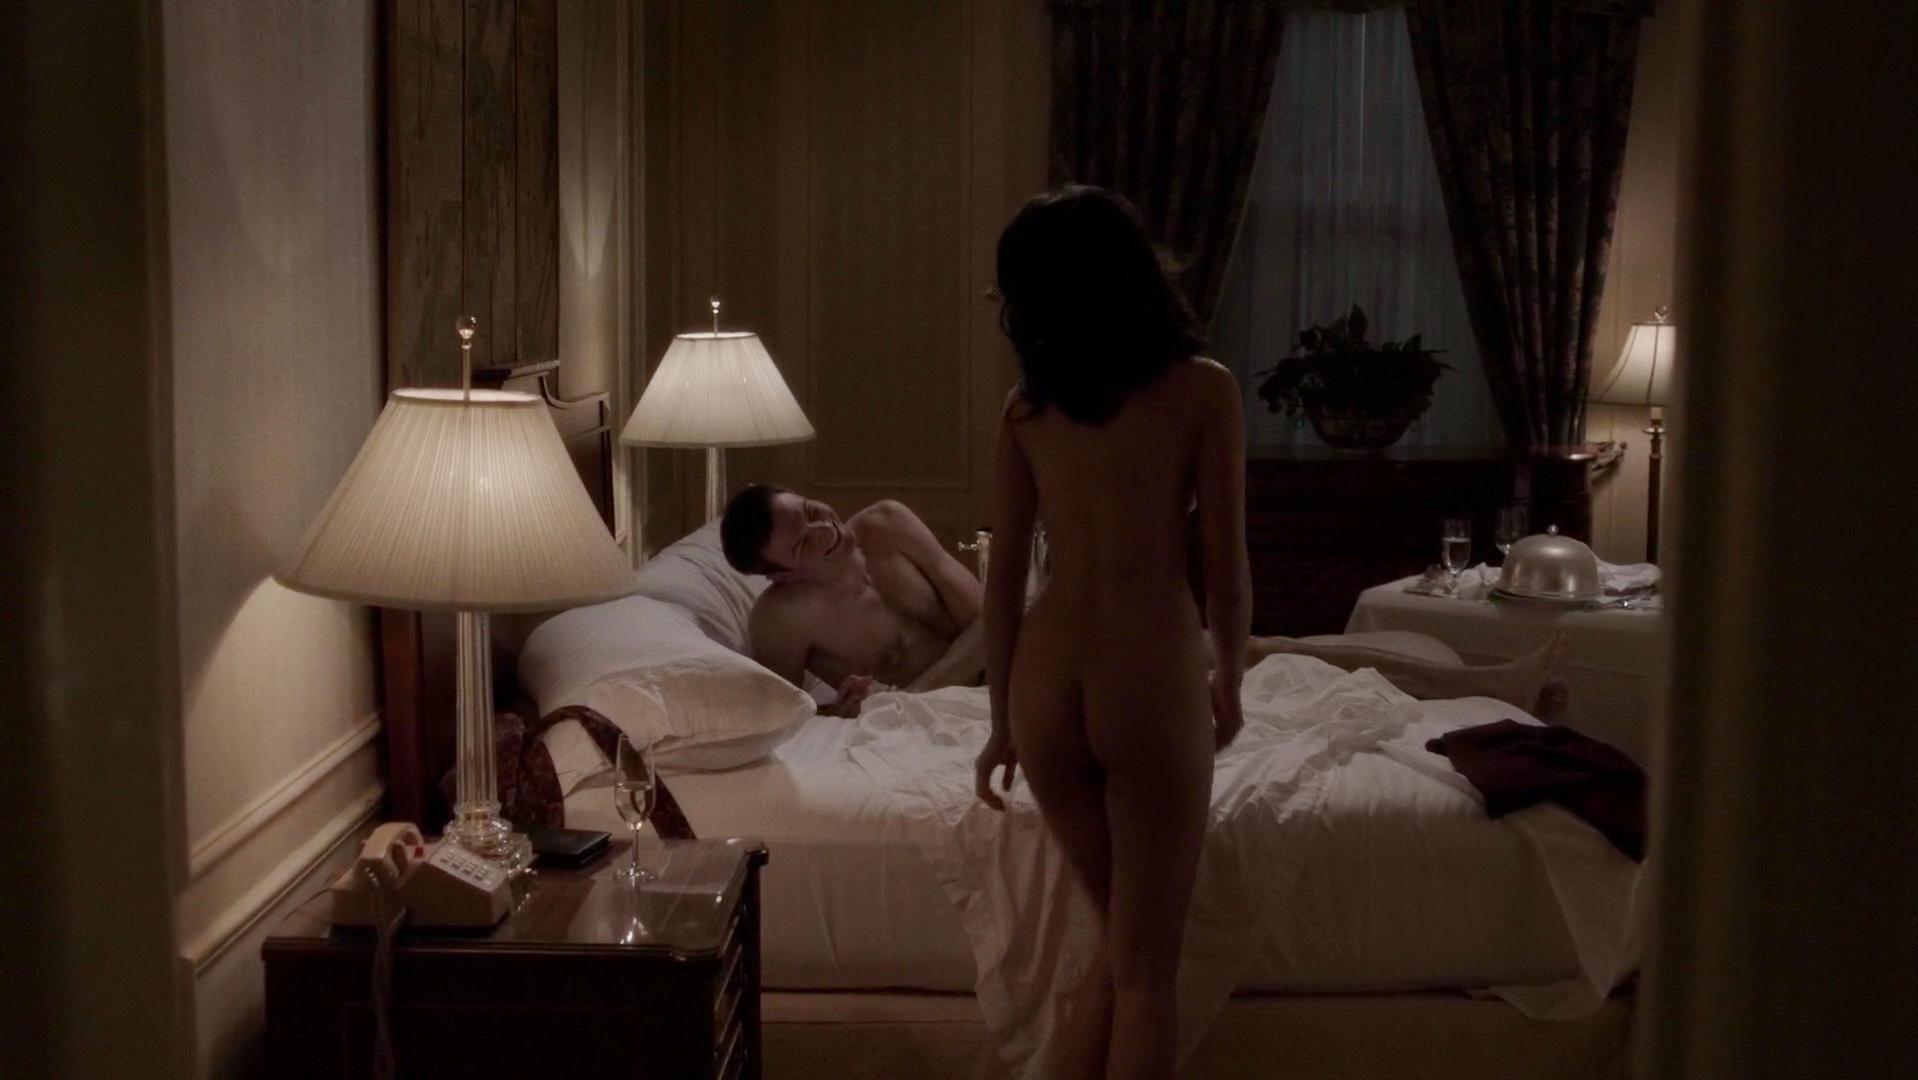 Annet Mahendru nude - The Americans s02e07 (2014)